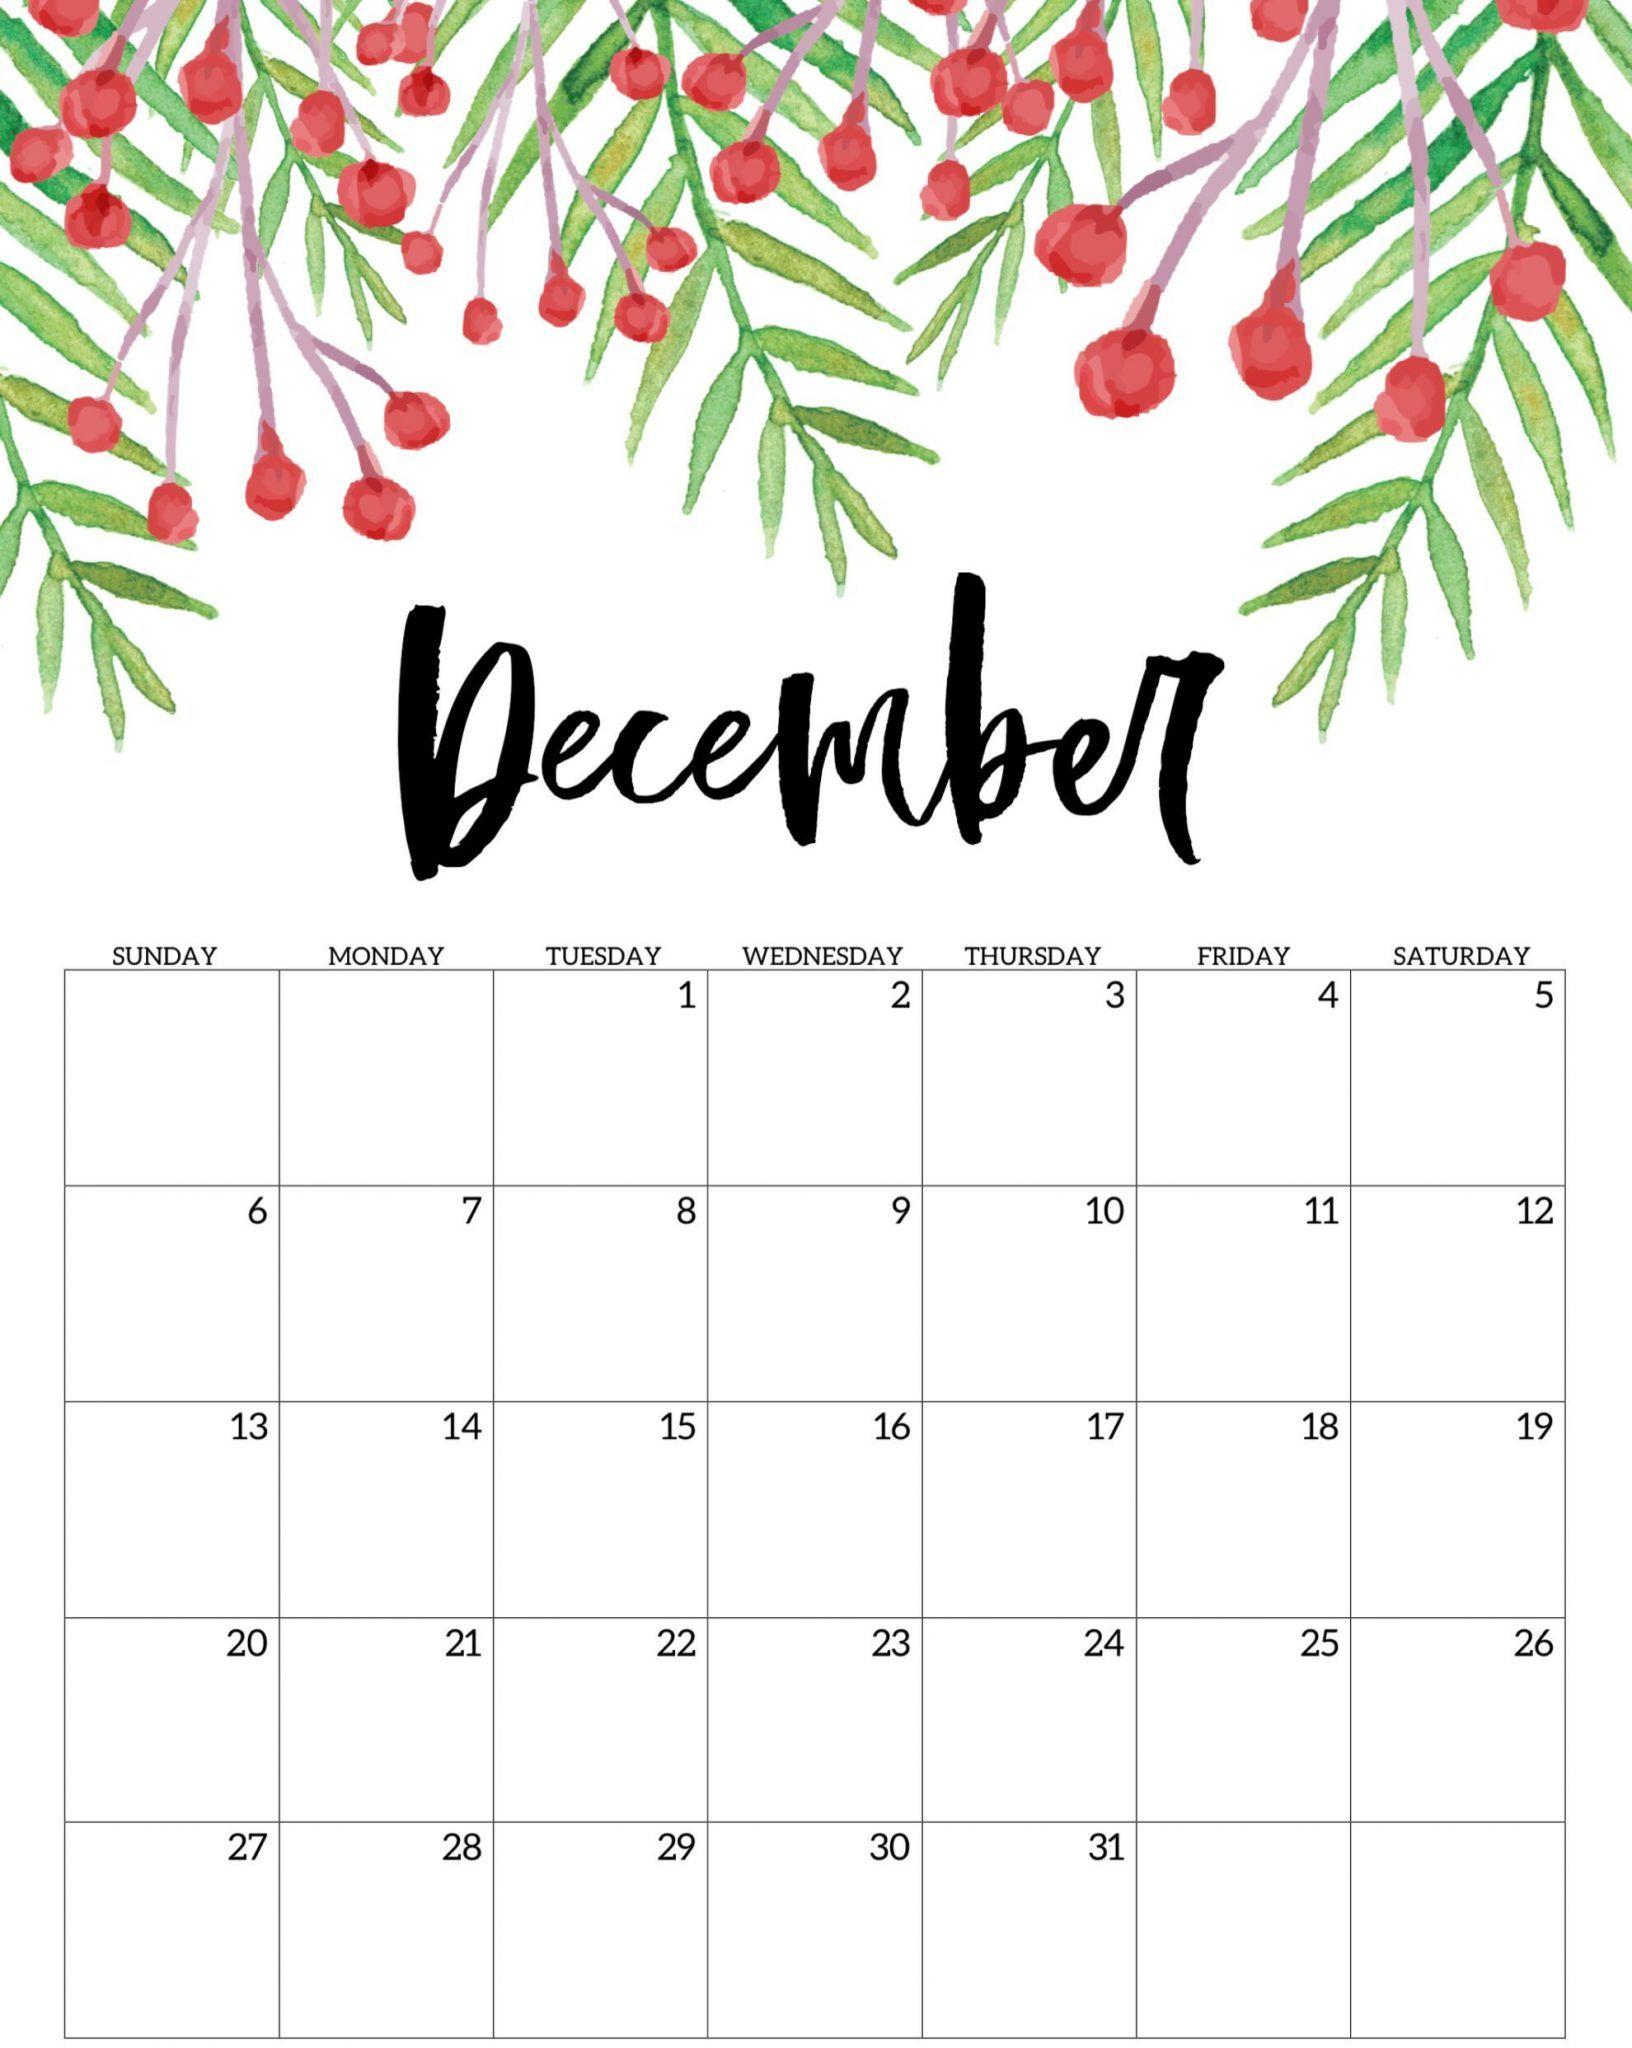 December Calendar 2020 Printable Blank Template With ...